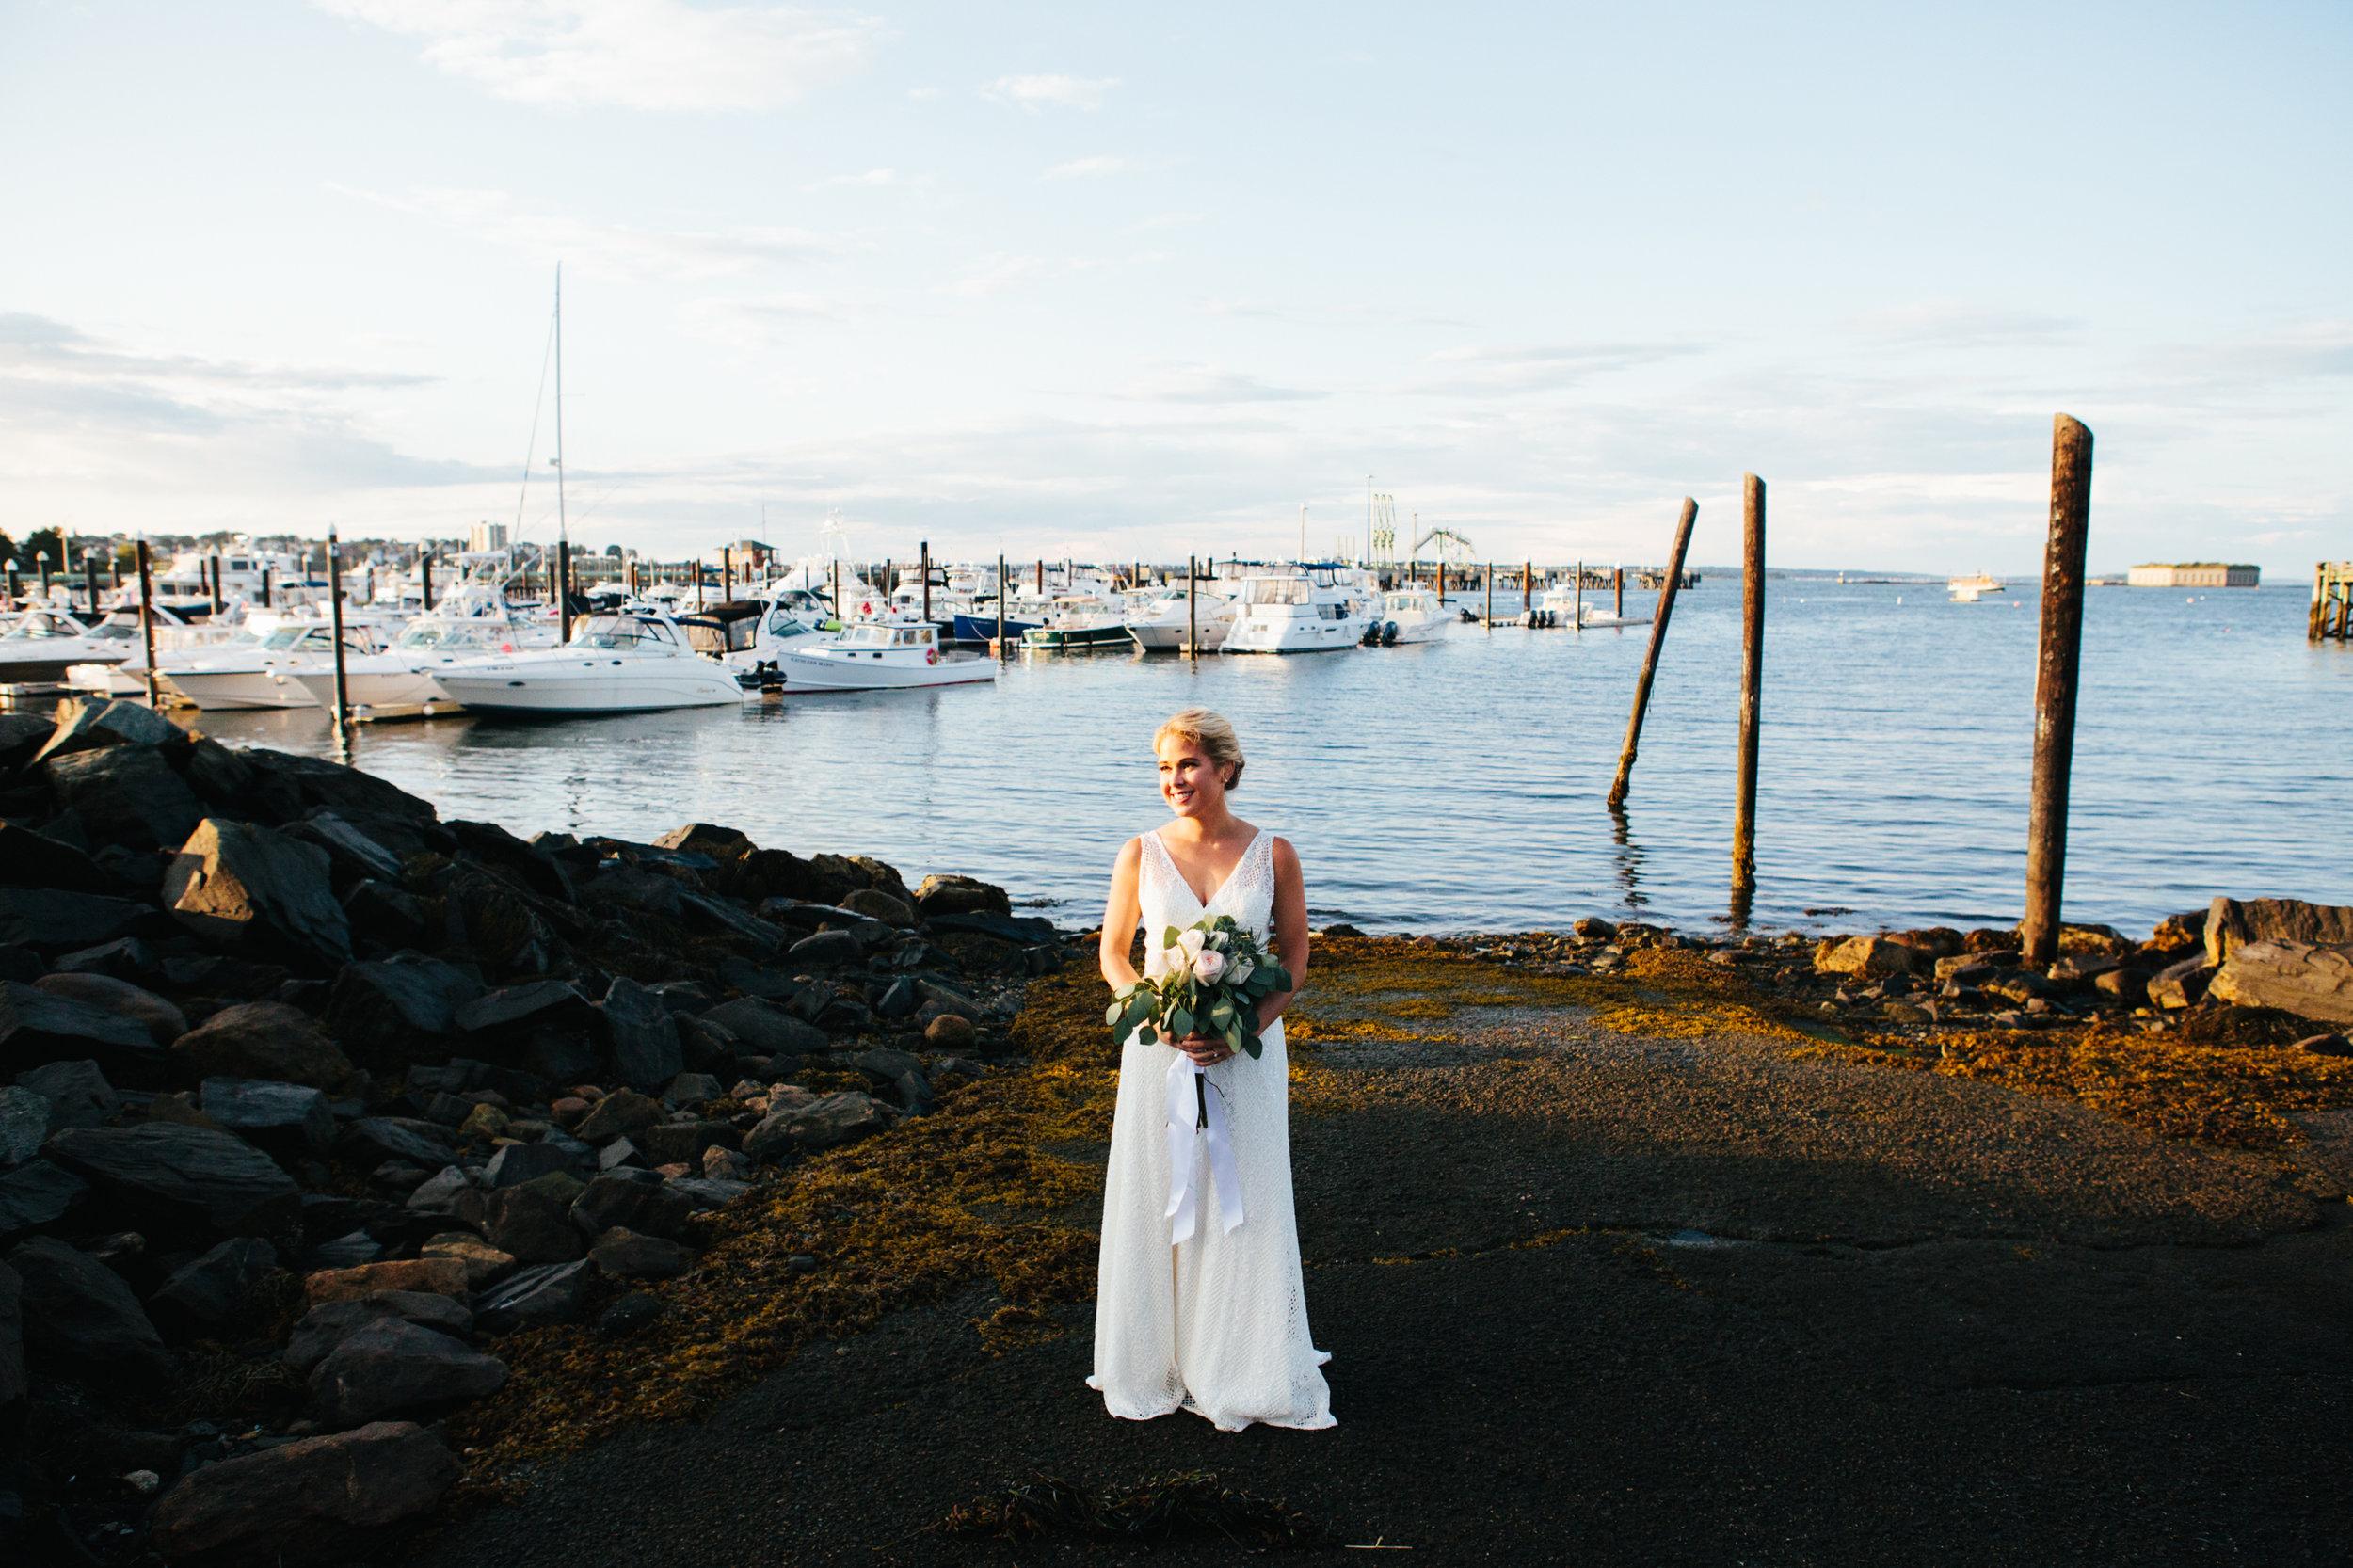 spring-point-ledge-lighthouse-wedding-south-portland-maine-3389.jpg